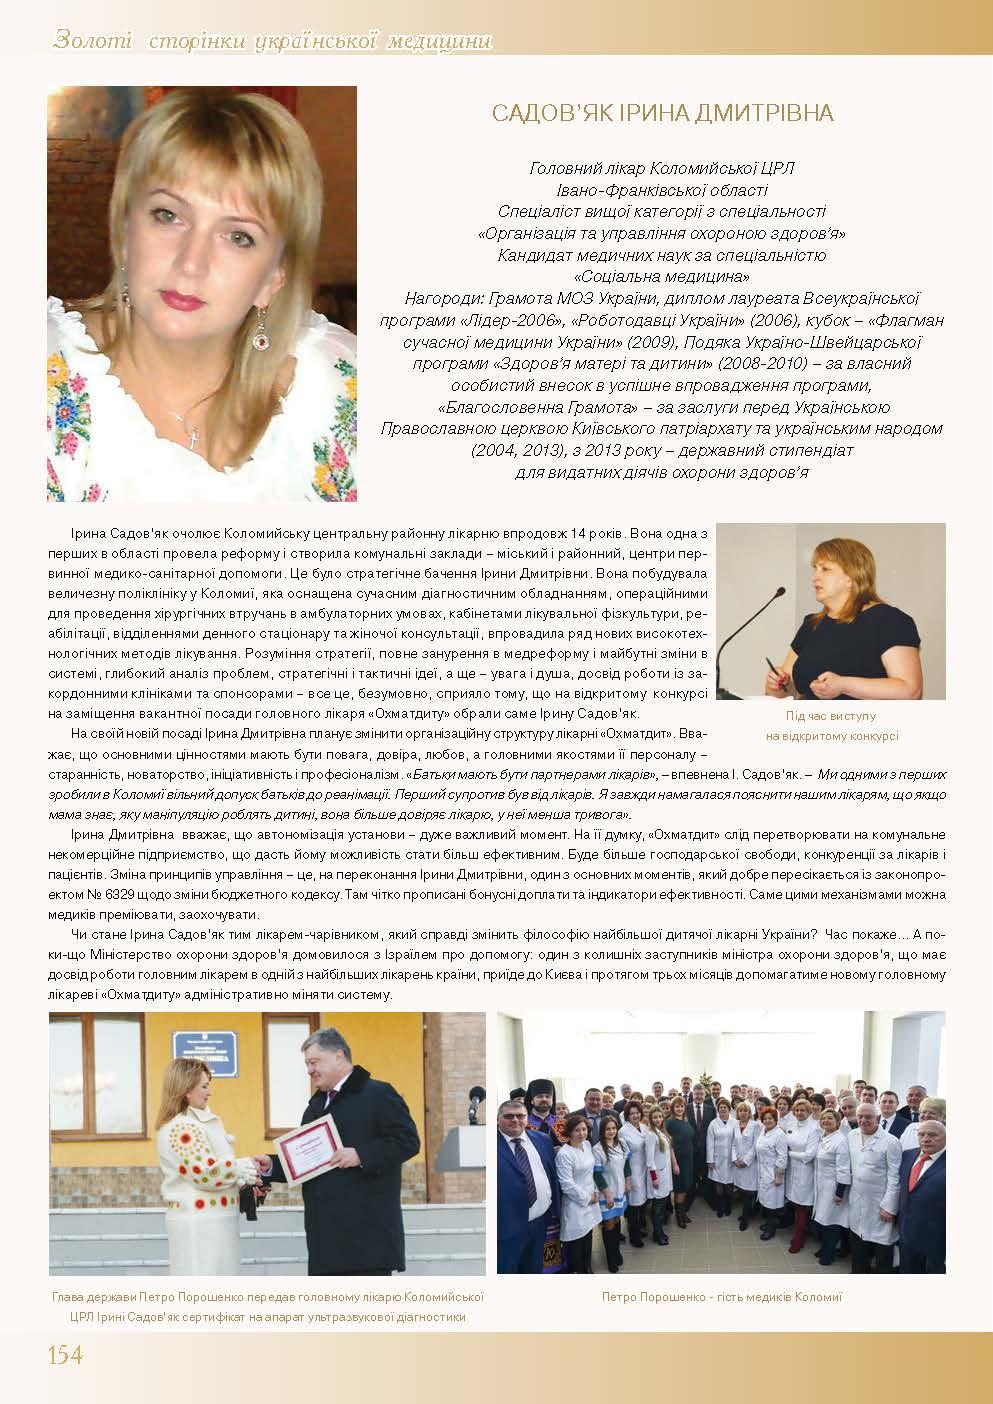 Садов'як Ірина Дмитрівна